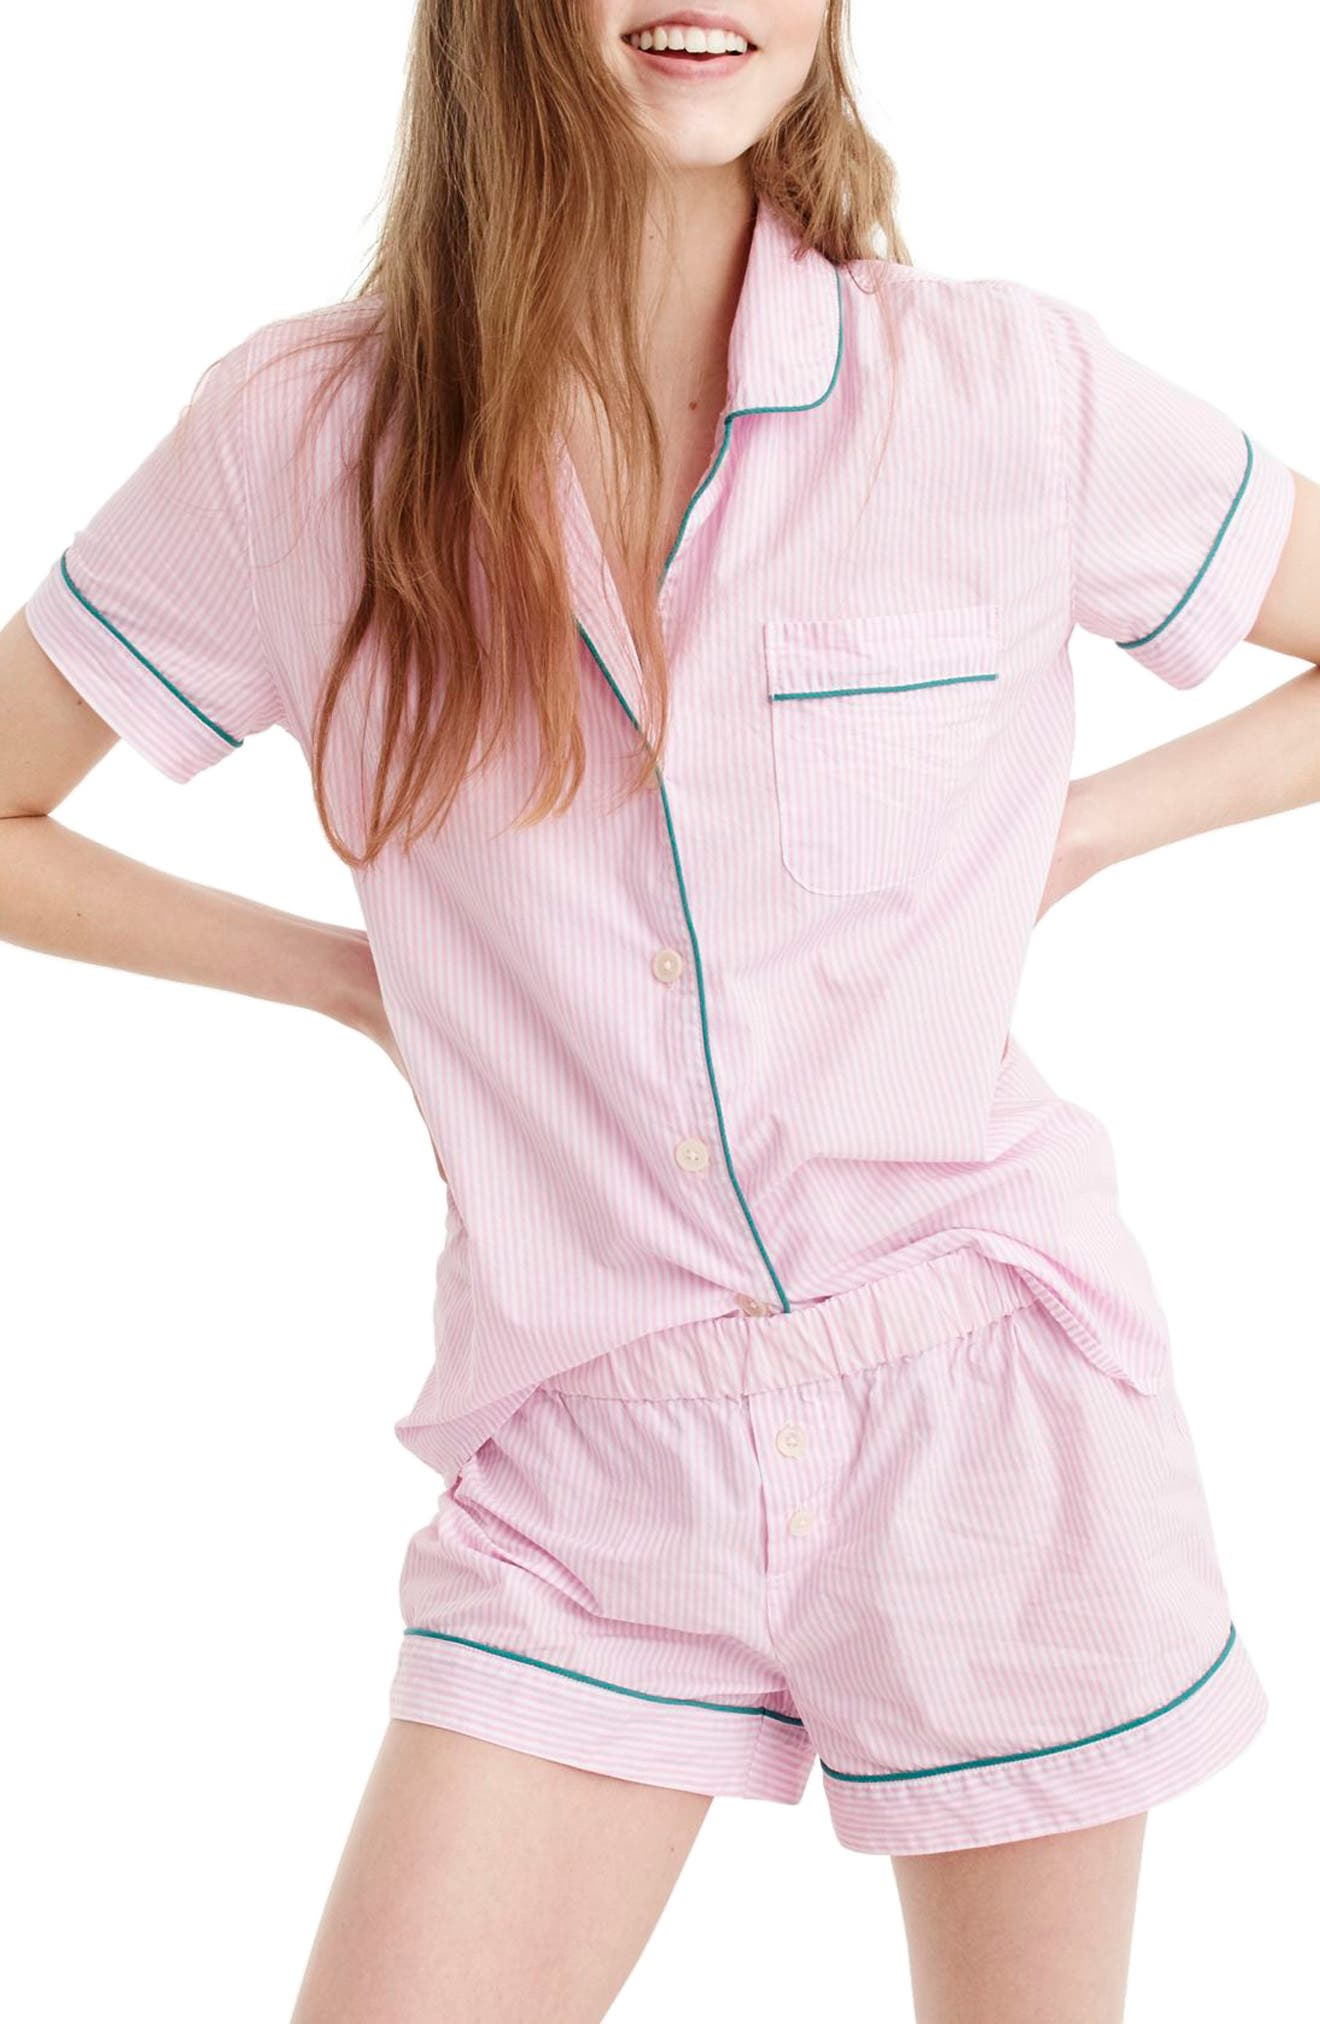 Tipped Short Pajamas,                             Main thumbnail 1, color,                             White Hibiscus